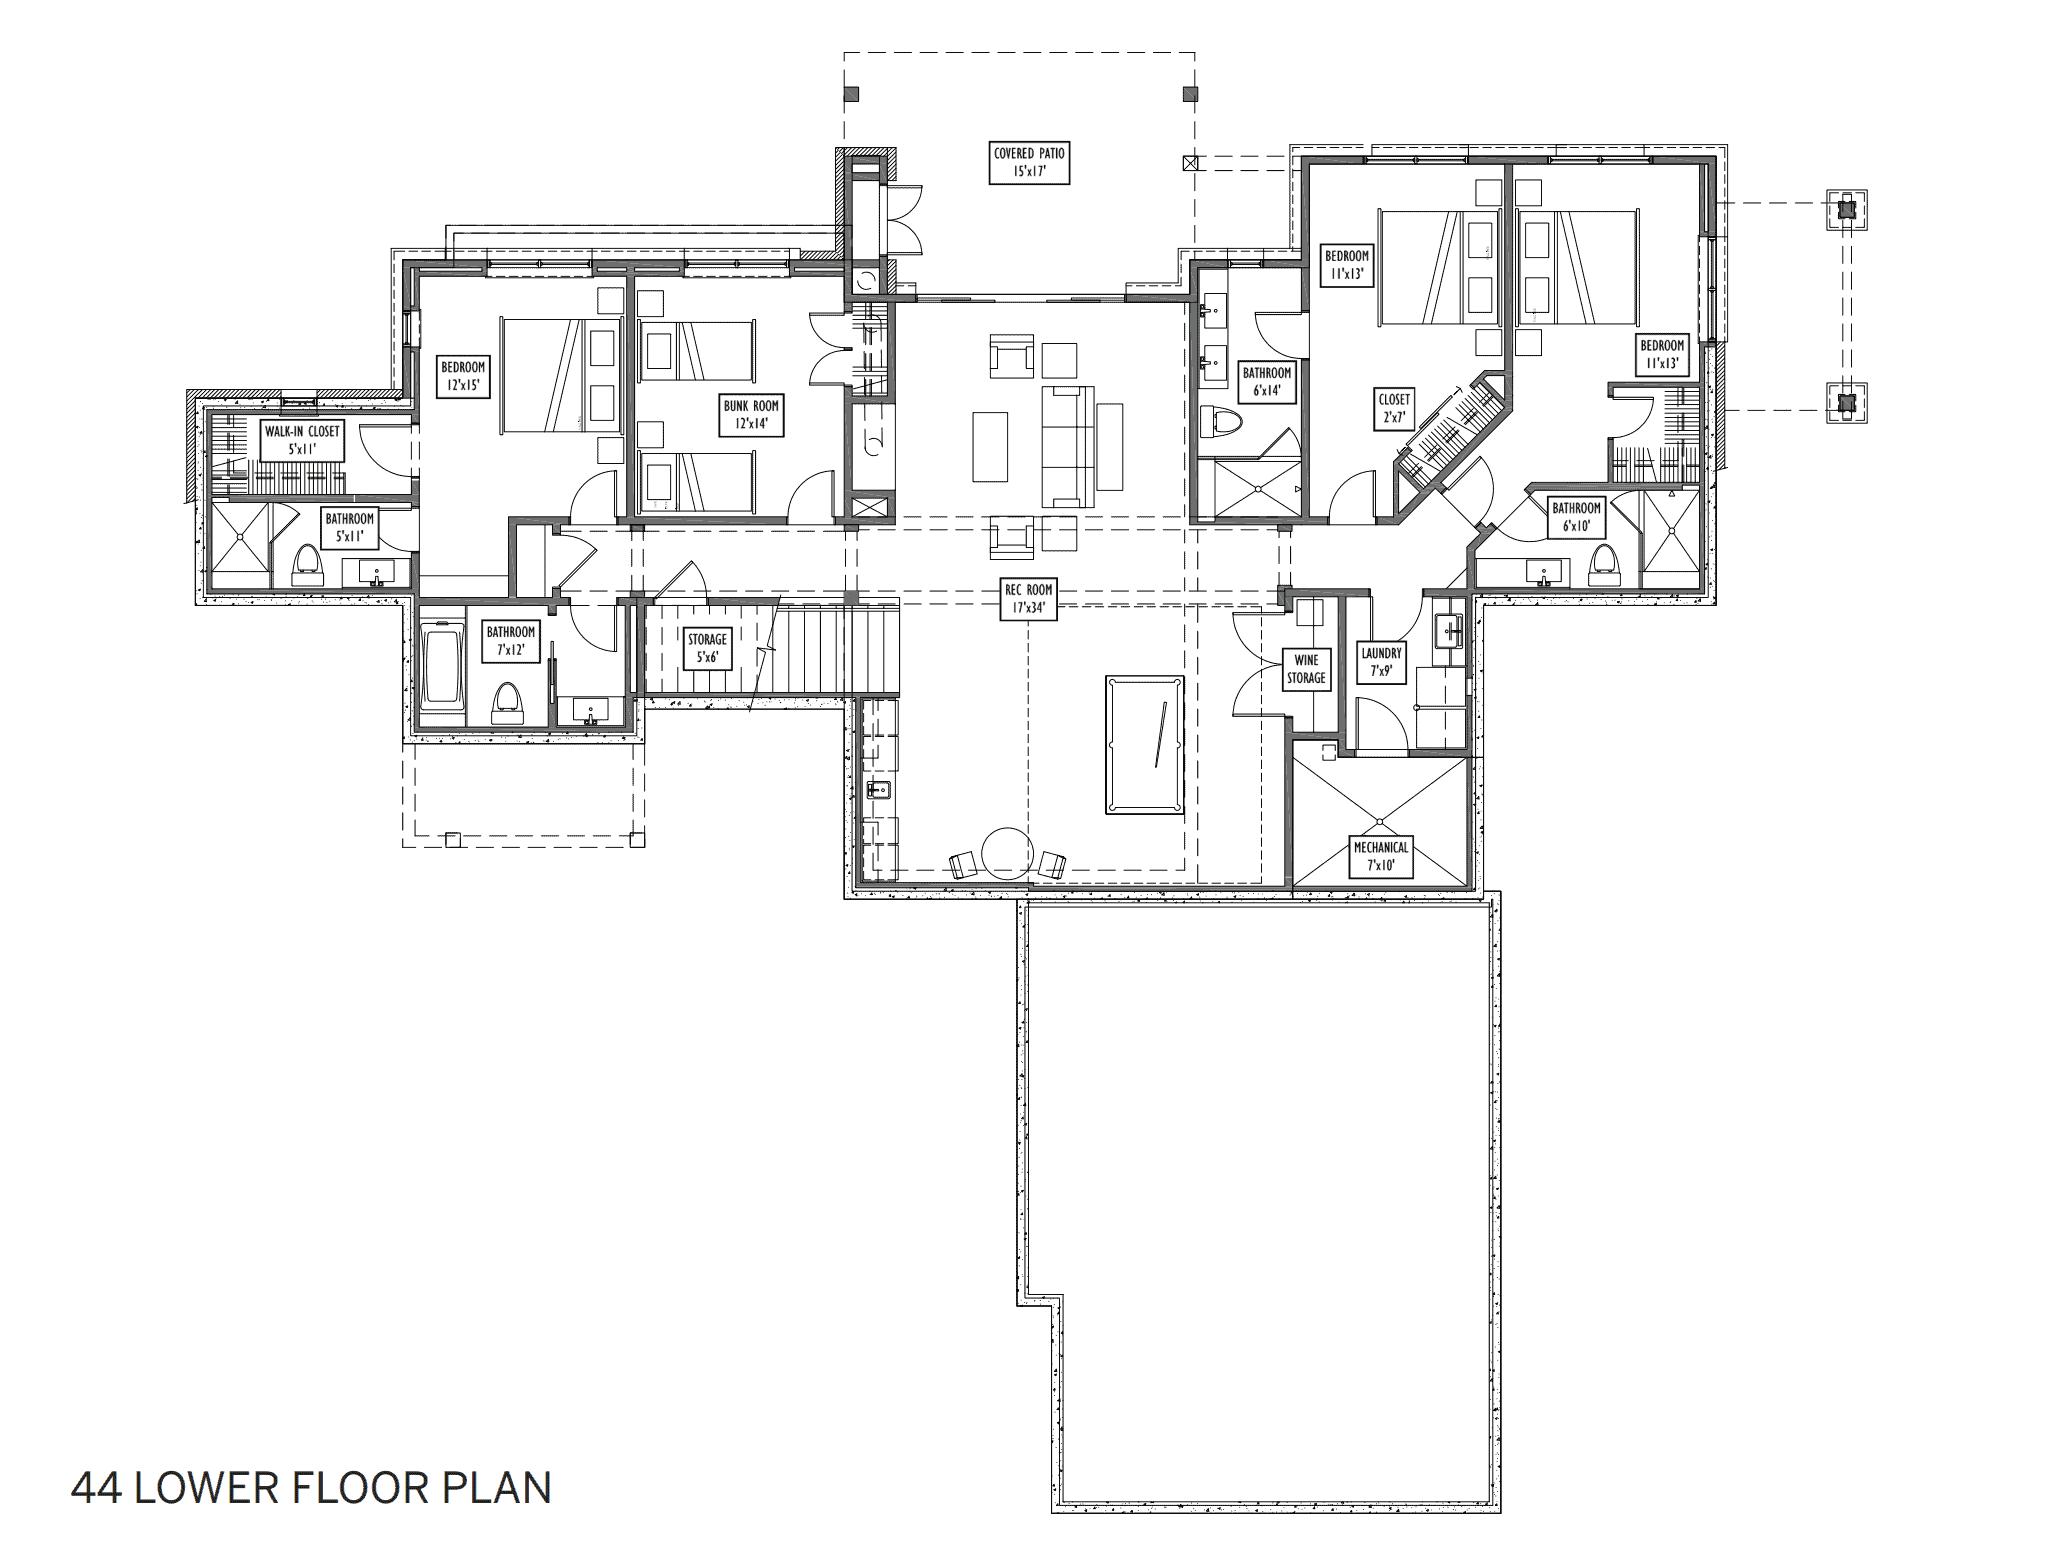 lot 44 floor plan 2 - Alpine Mountain Ranch & Club Broker Toolkit